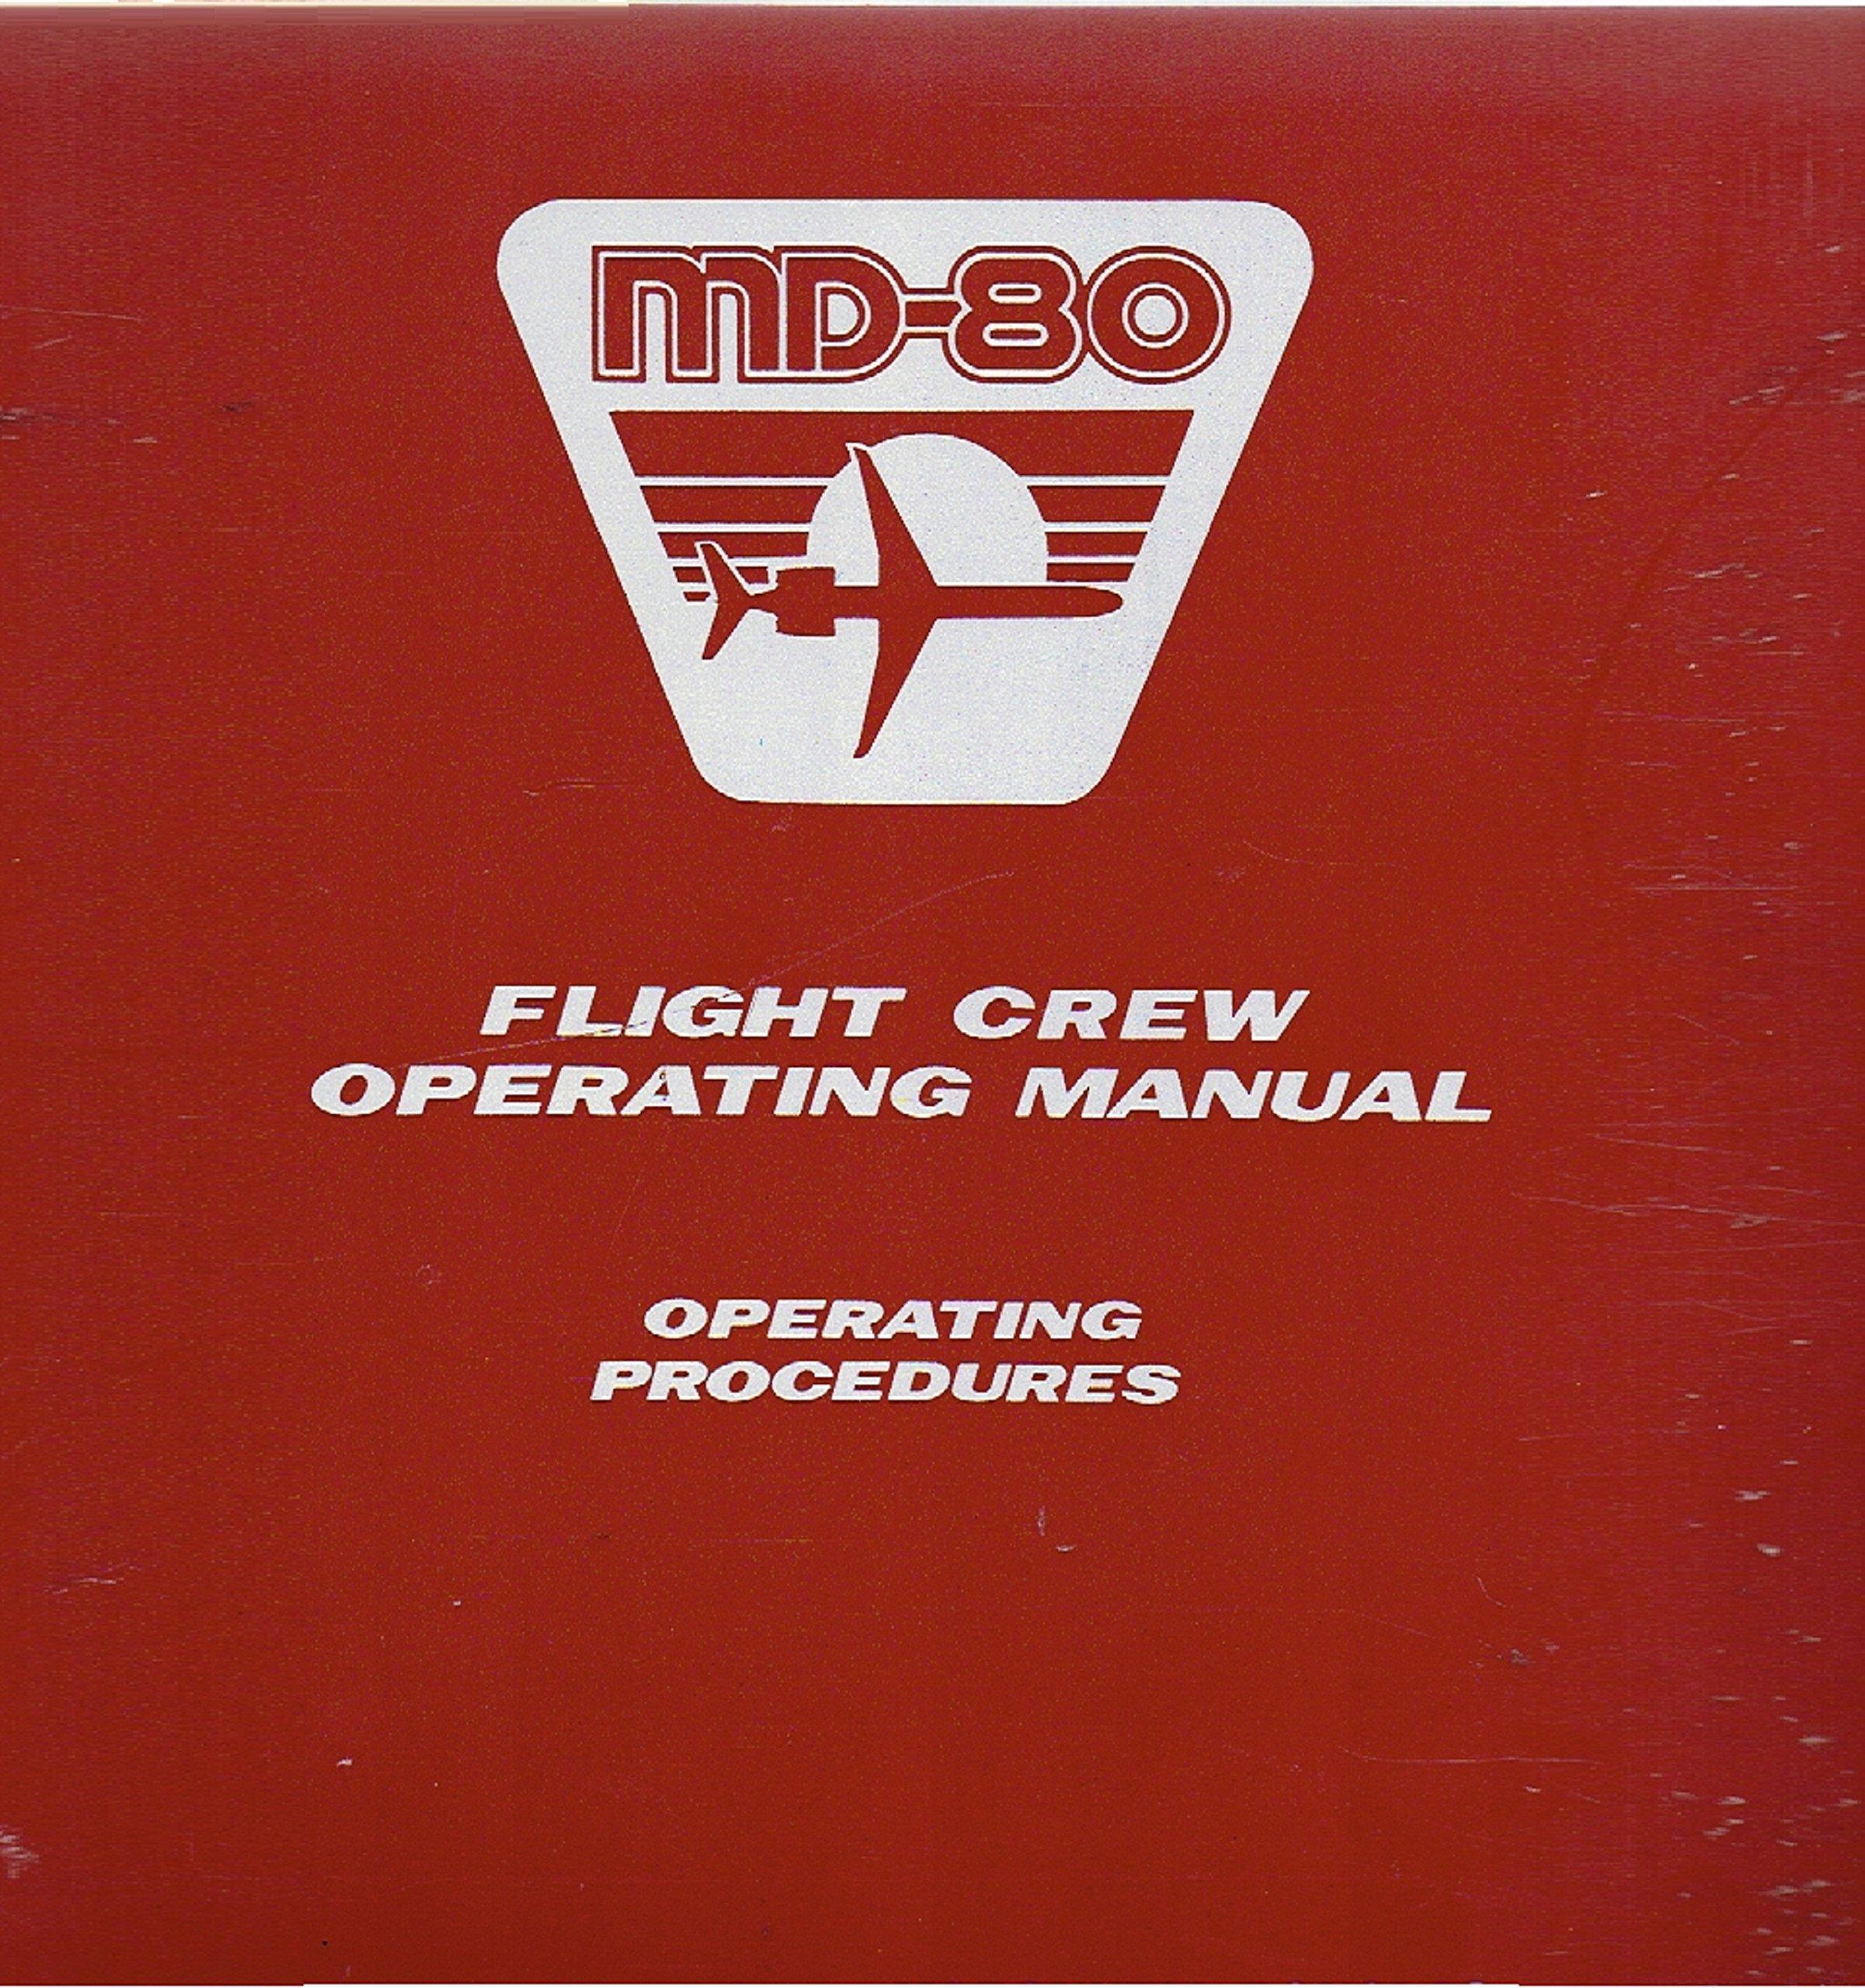 md 80 operating procedures flight crew operating manual mcdonnell rh amazon com